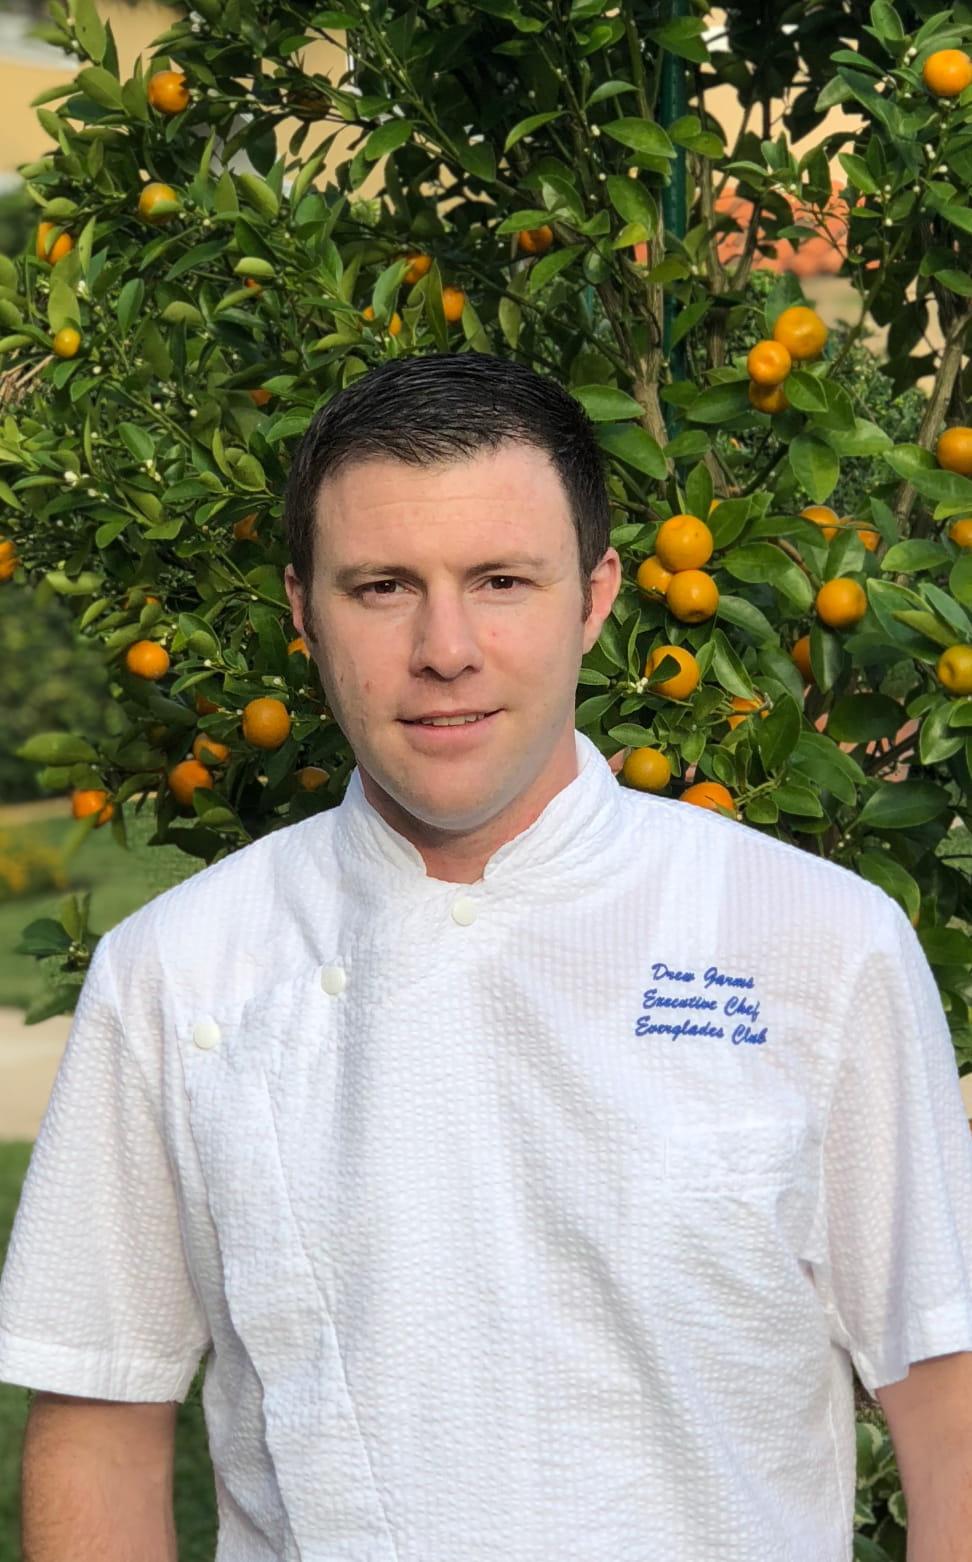 Chef Drew Garms